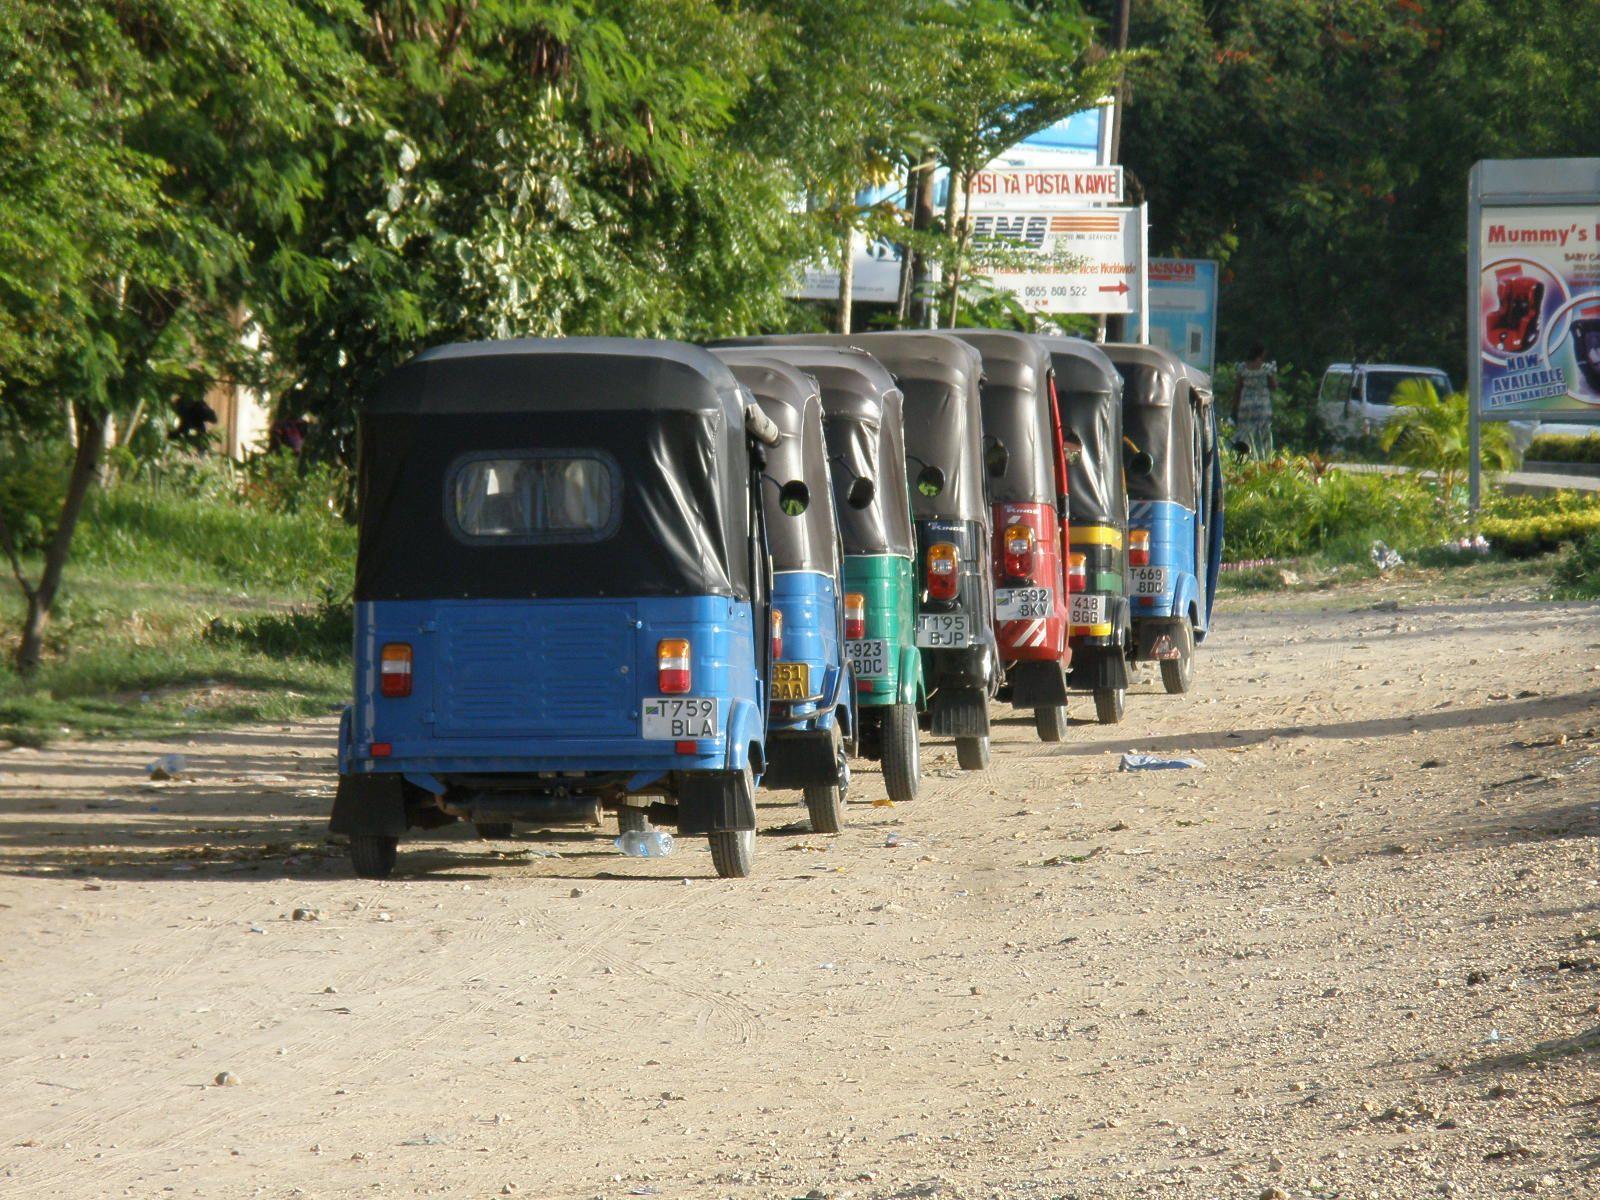 Tanzania Taxis